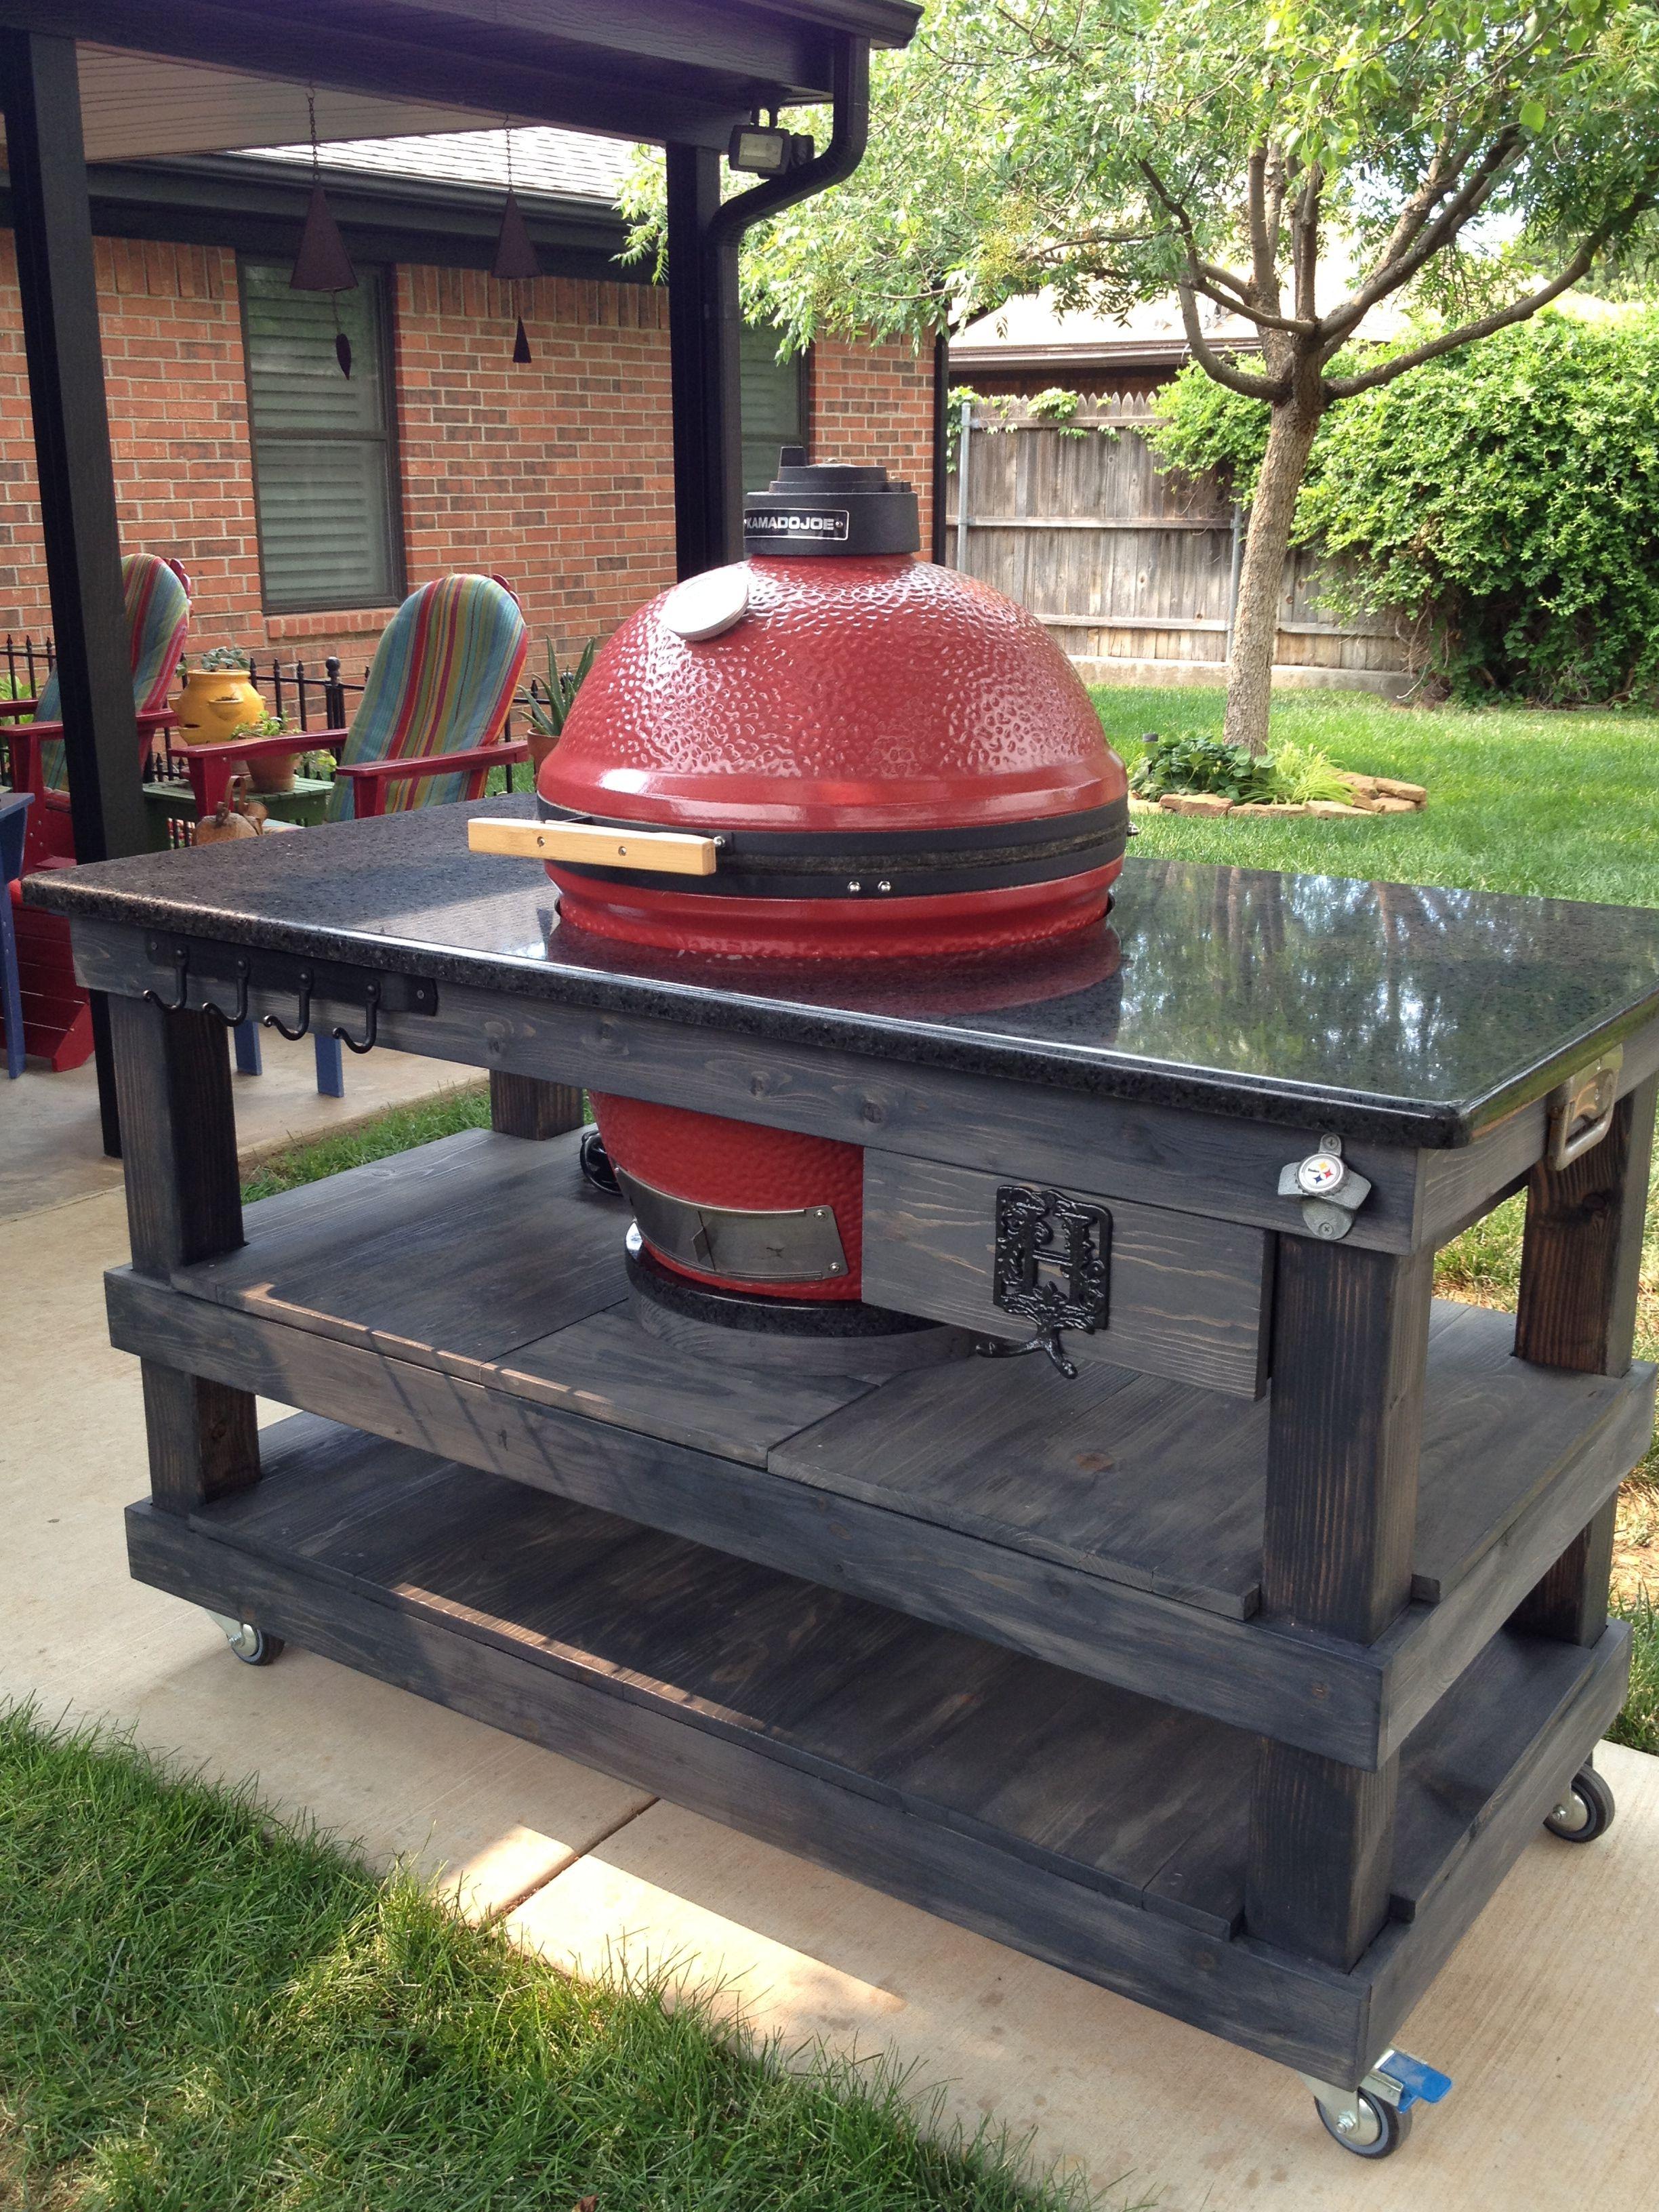 Pin By Mike Hibbs On Kamado Joe Creations Diy Outdoor Kitchen